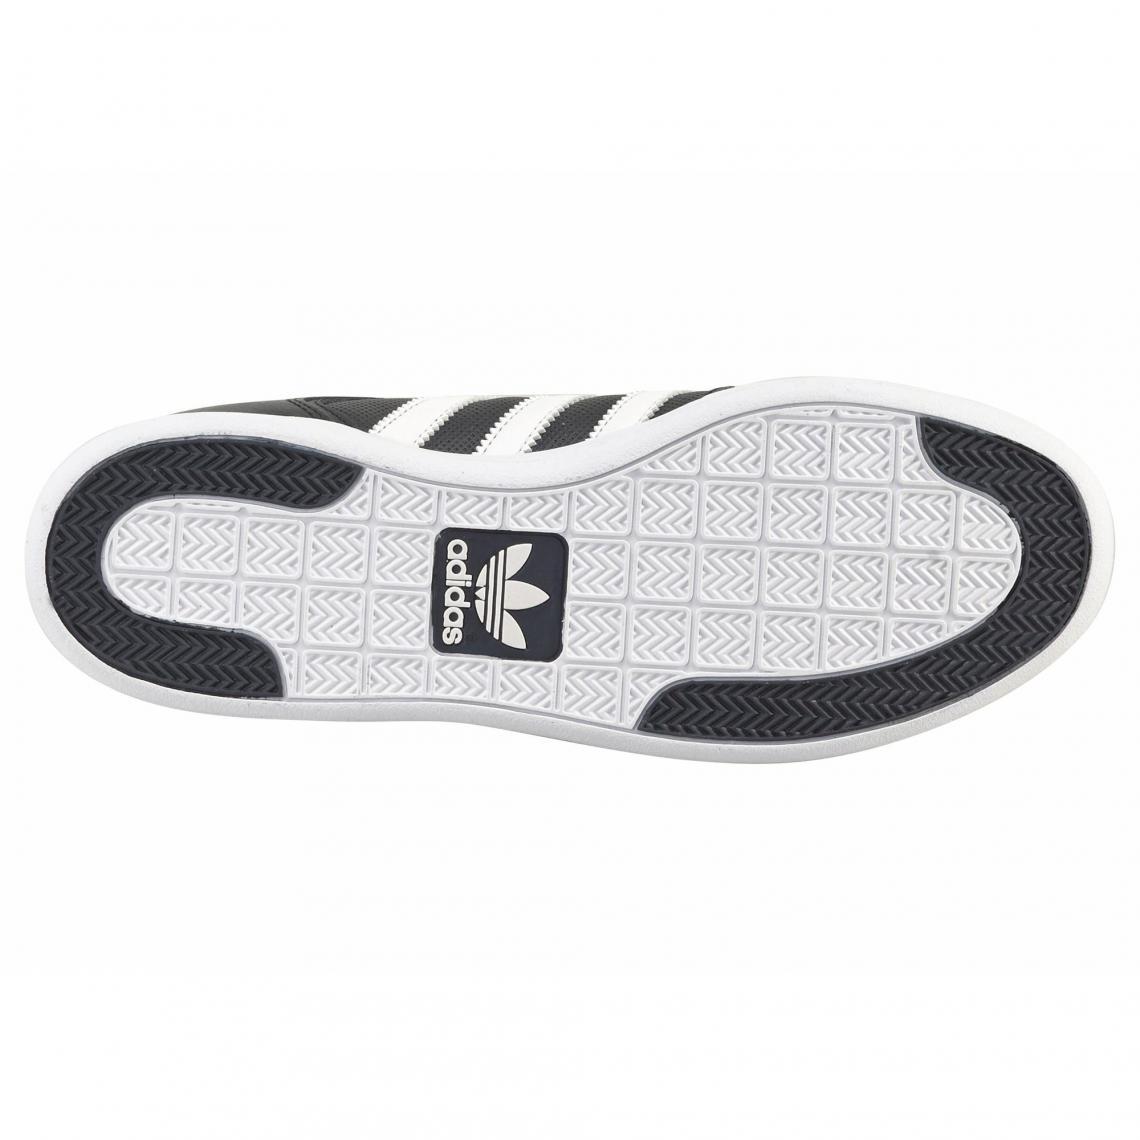 c8050bd221298 Sneaker Varial Low M homme adidas Originals - Noir - Blanc Adidas Originals